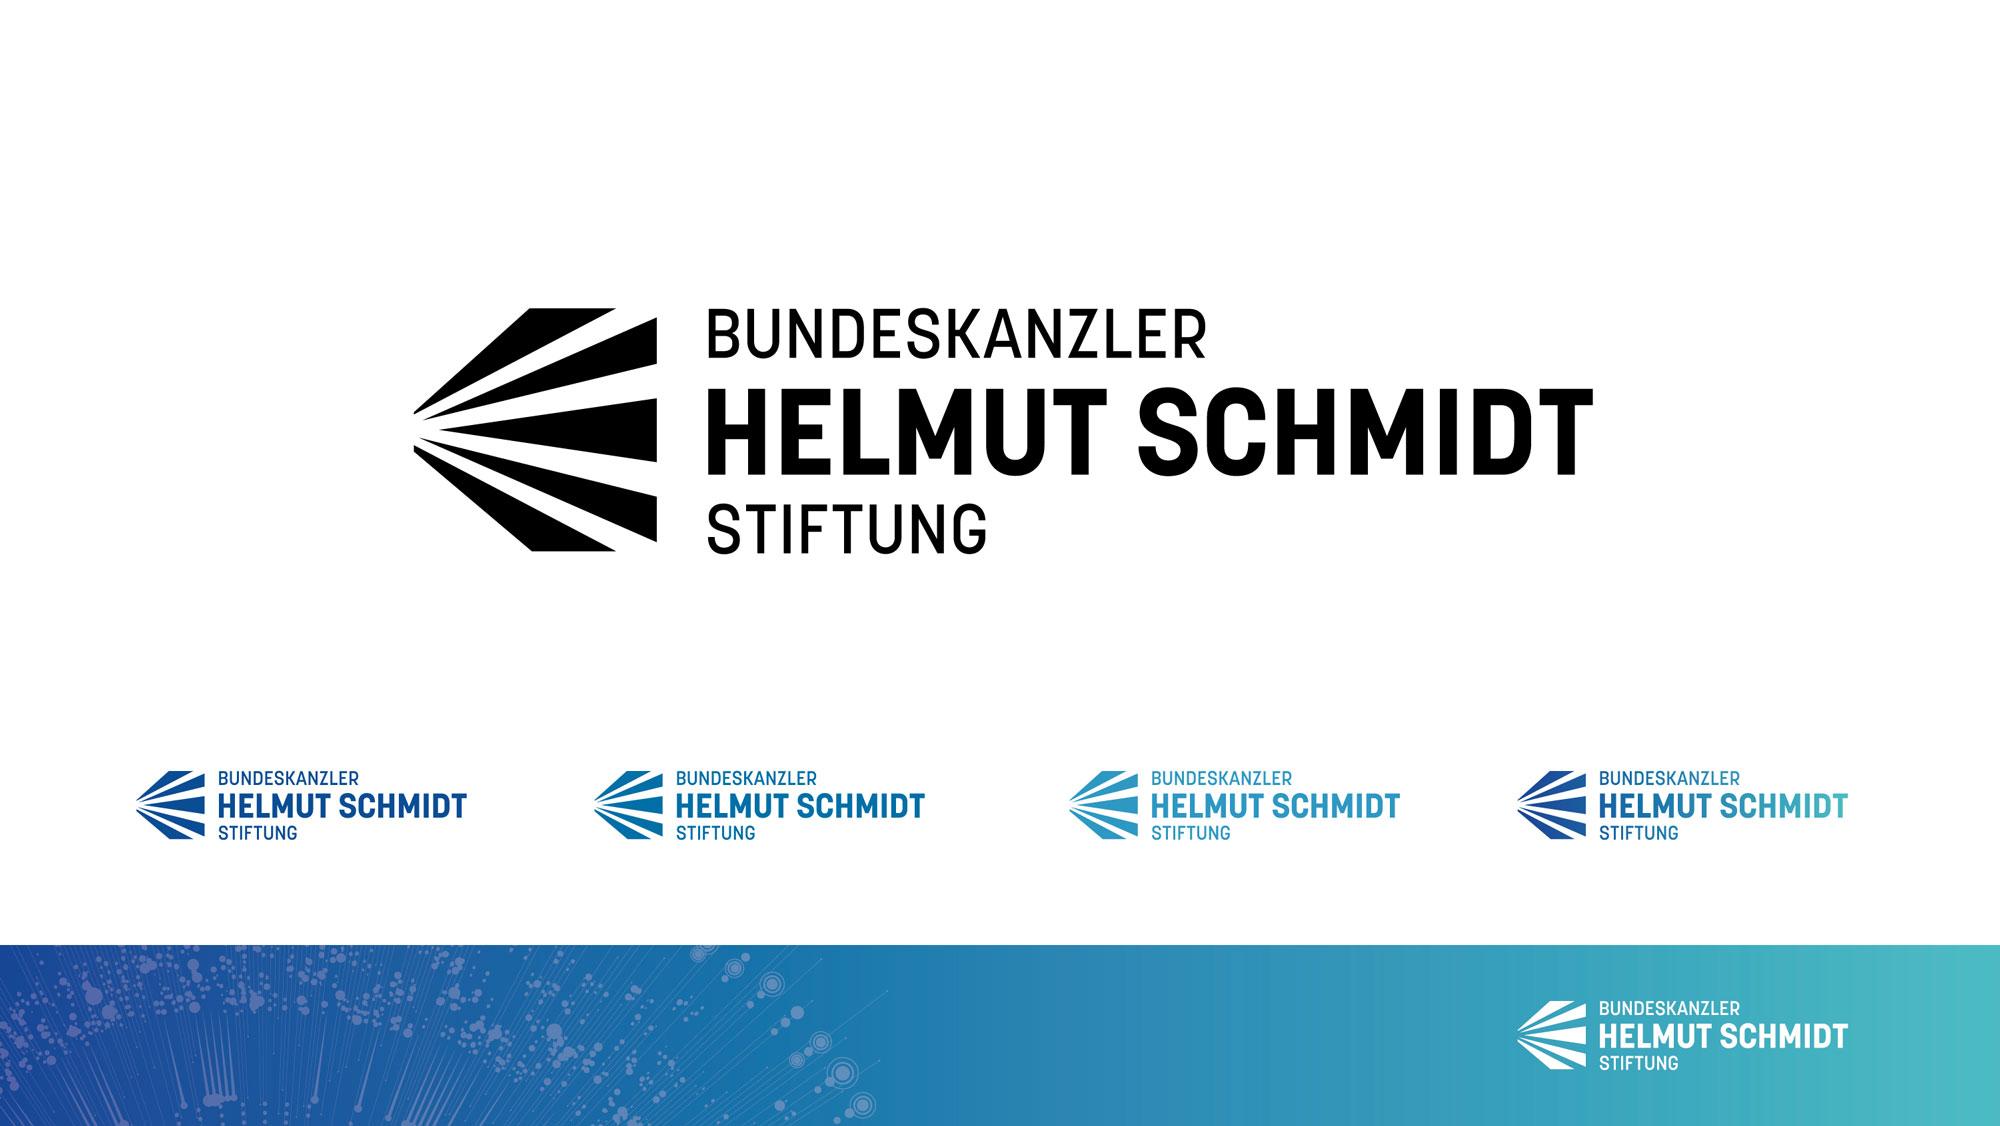 Corporate Design Bundeskanzler Helmut Schmidt Stiftung Logo Varianten